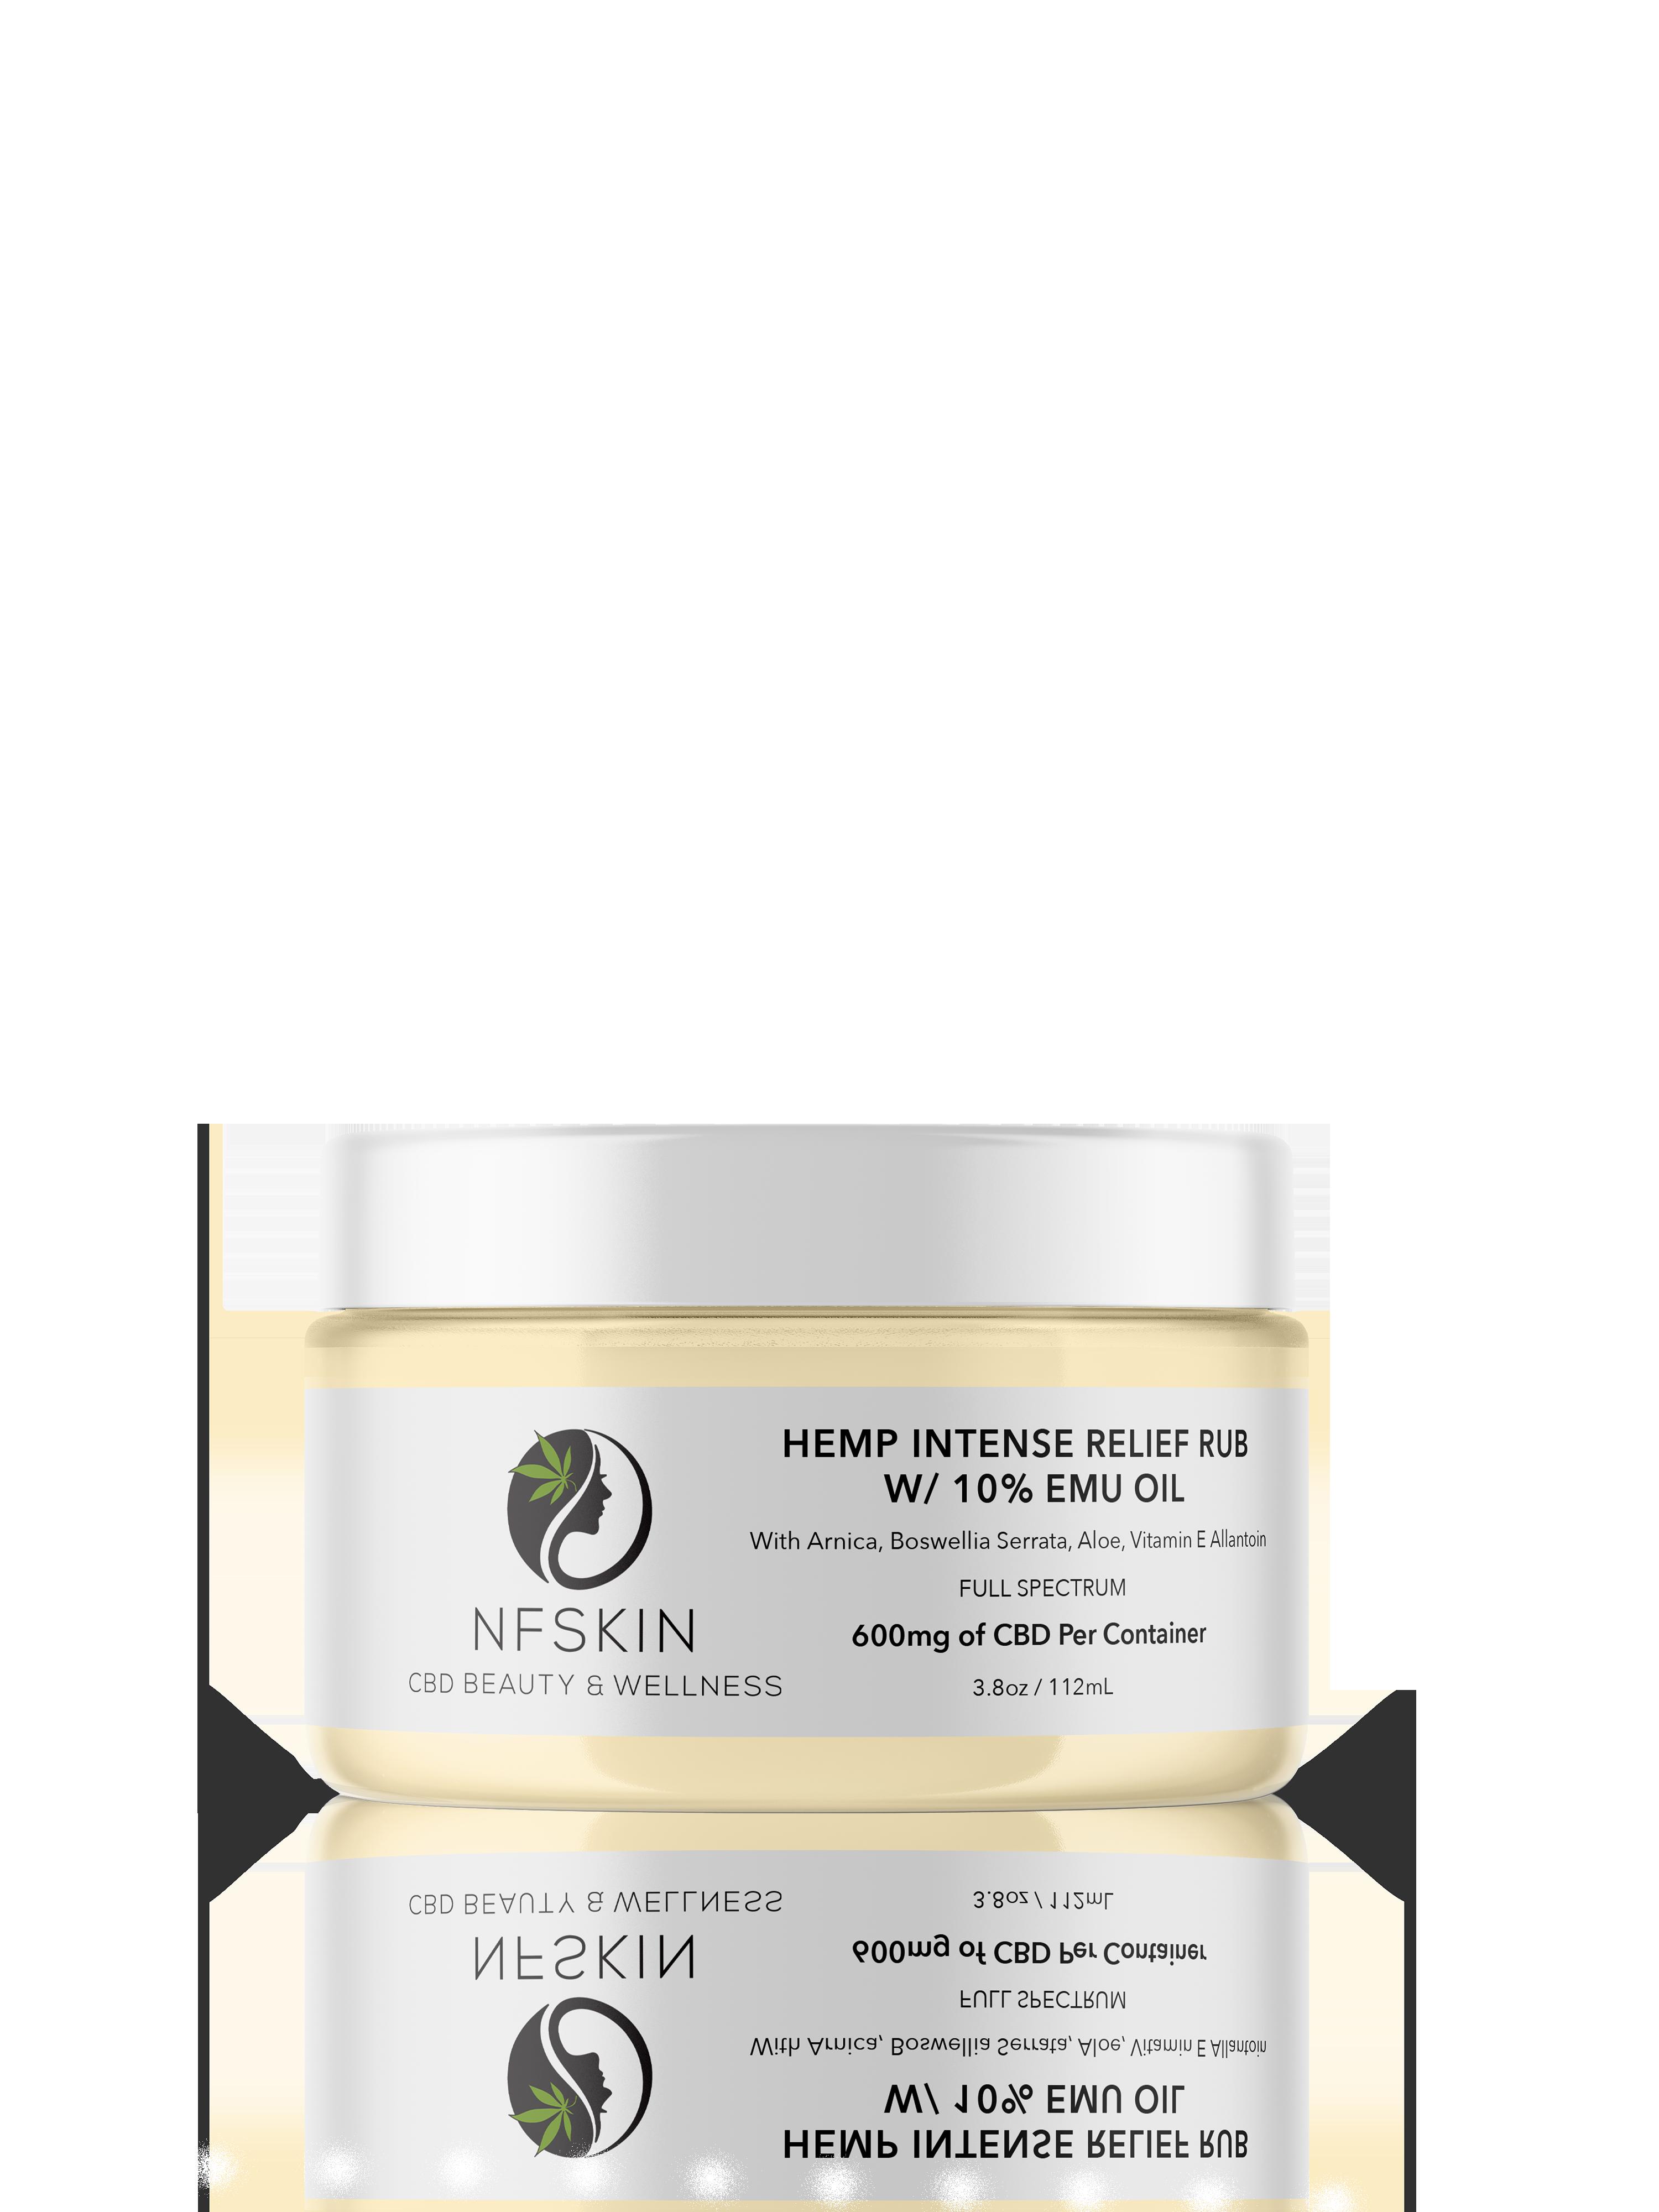 Hemp Intense Relief Rub w/ 10% Emu Oil – 600mg